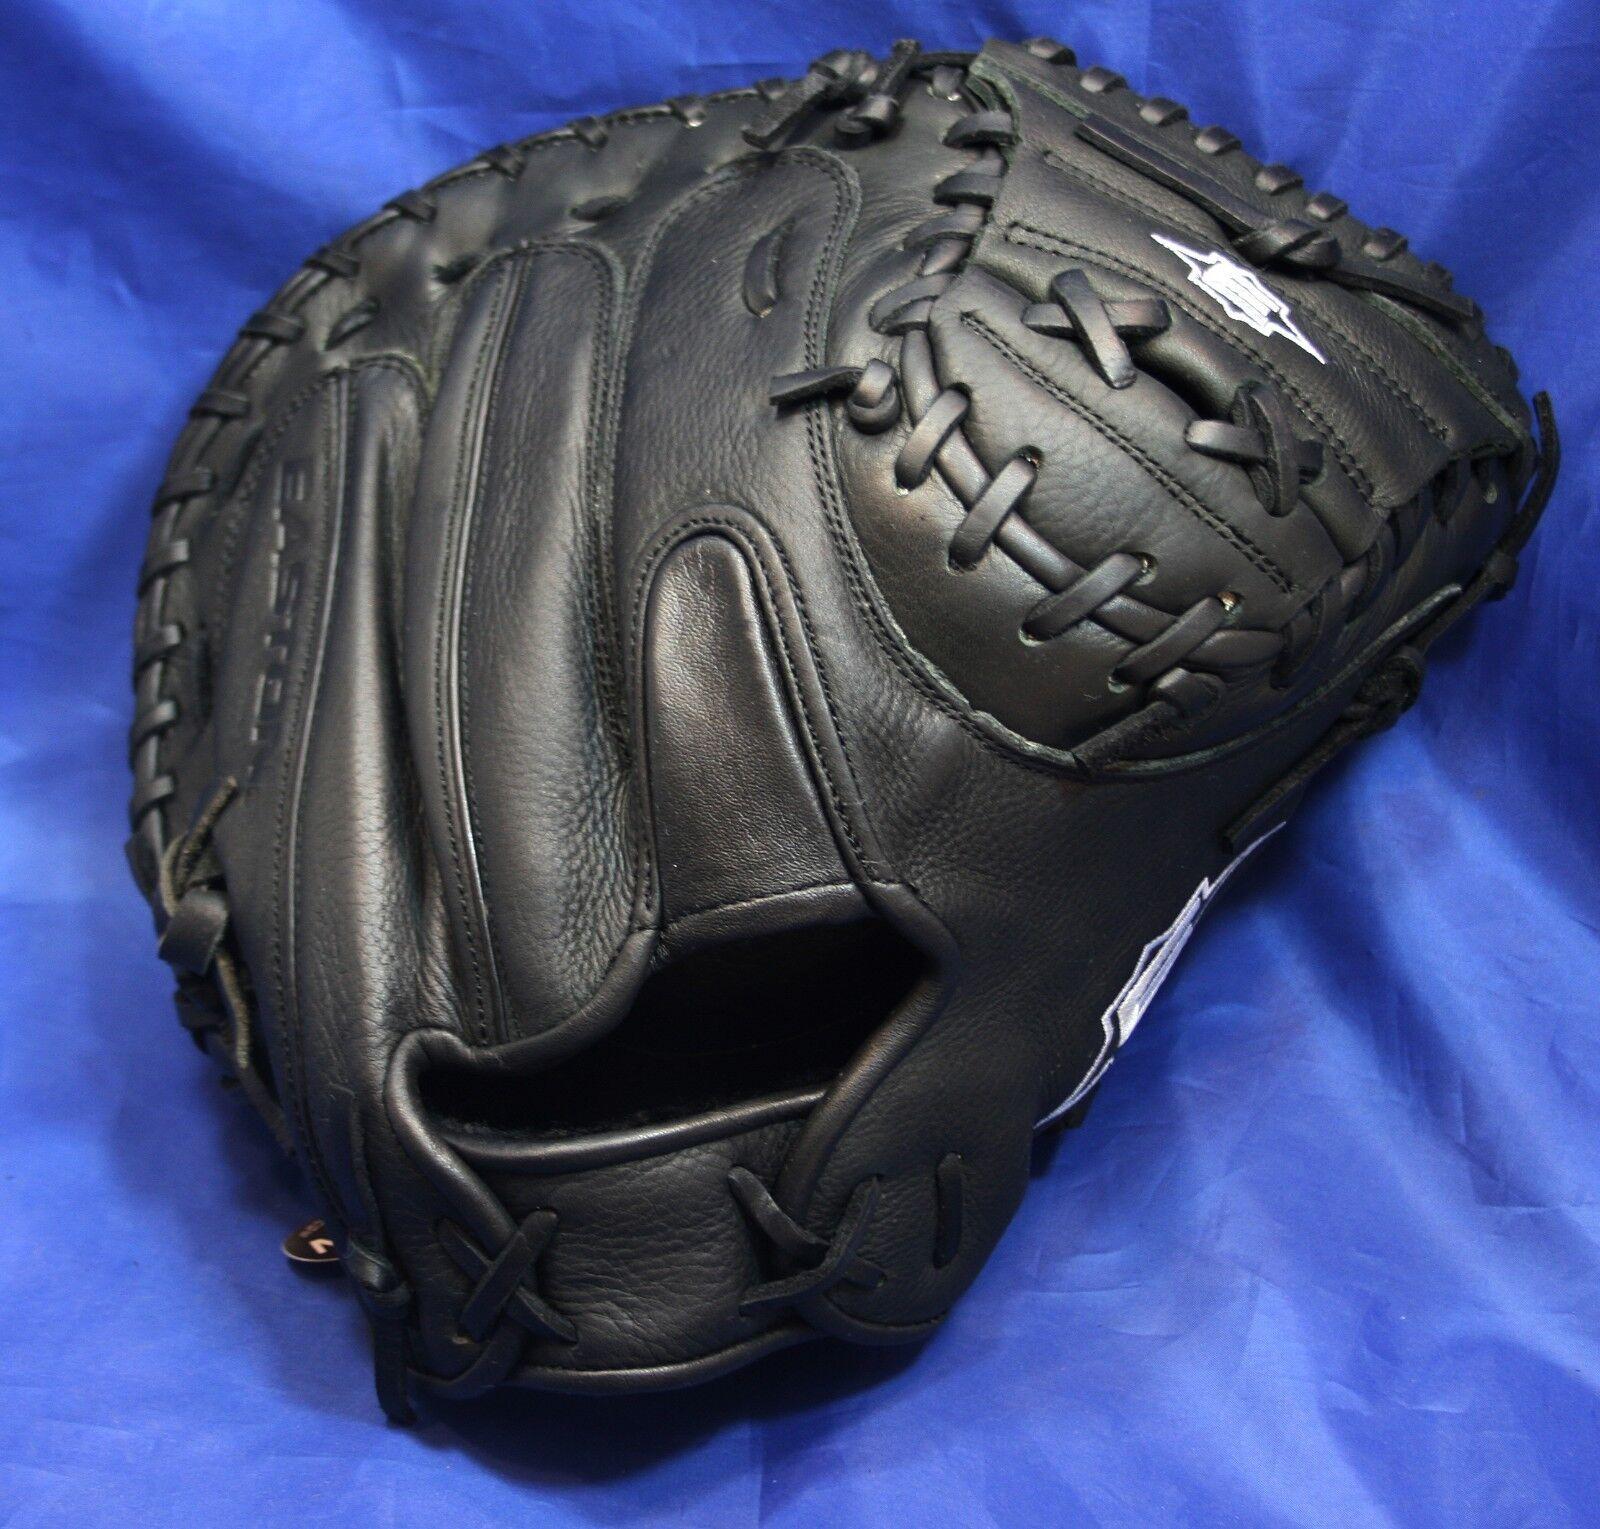 Easton Premier Professional Series PPX22B (33.5 ) Catcher's Mitt